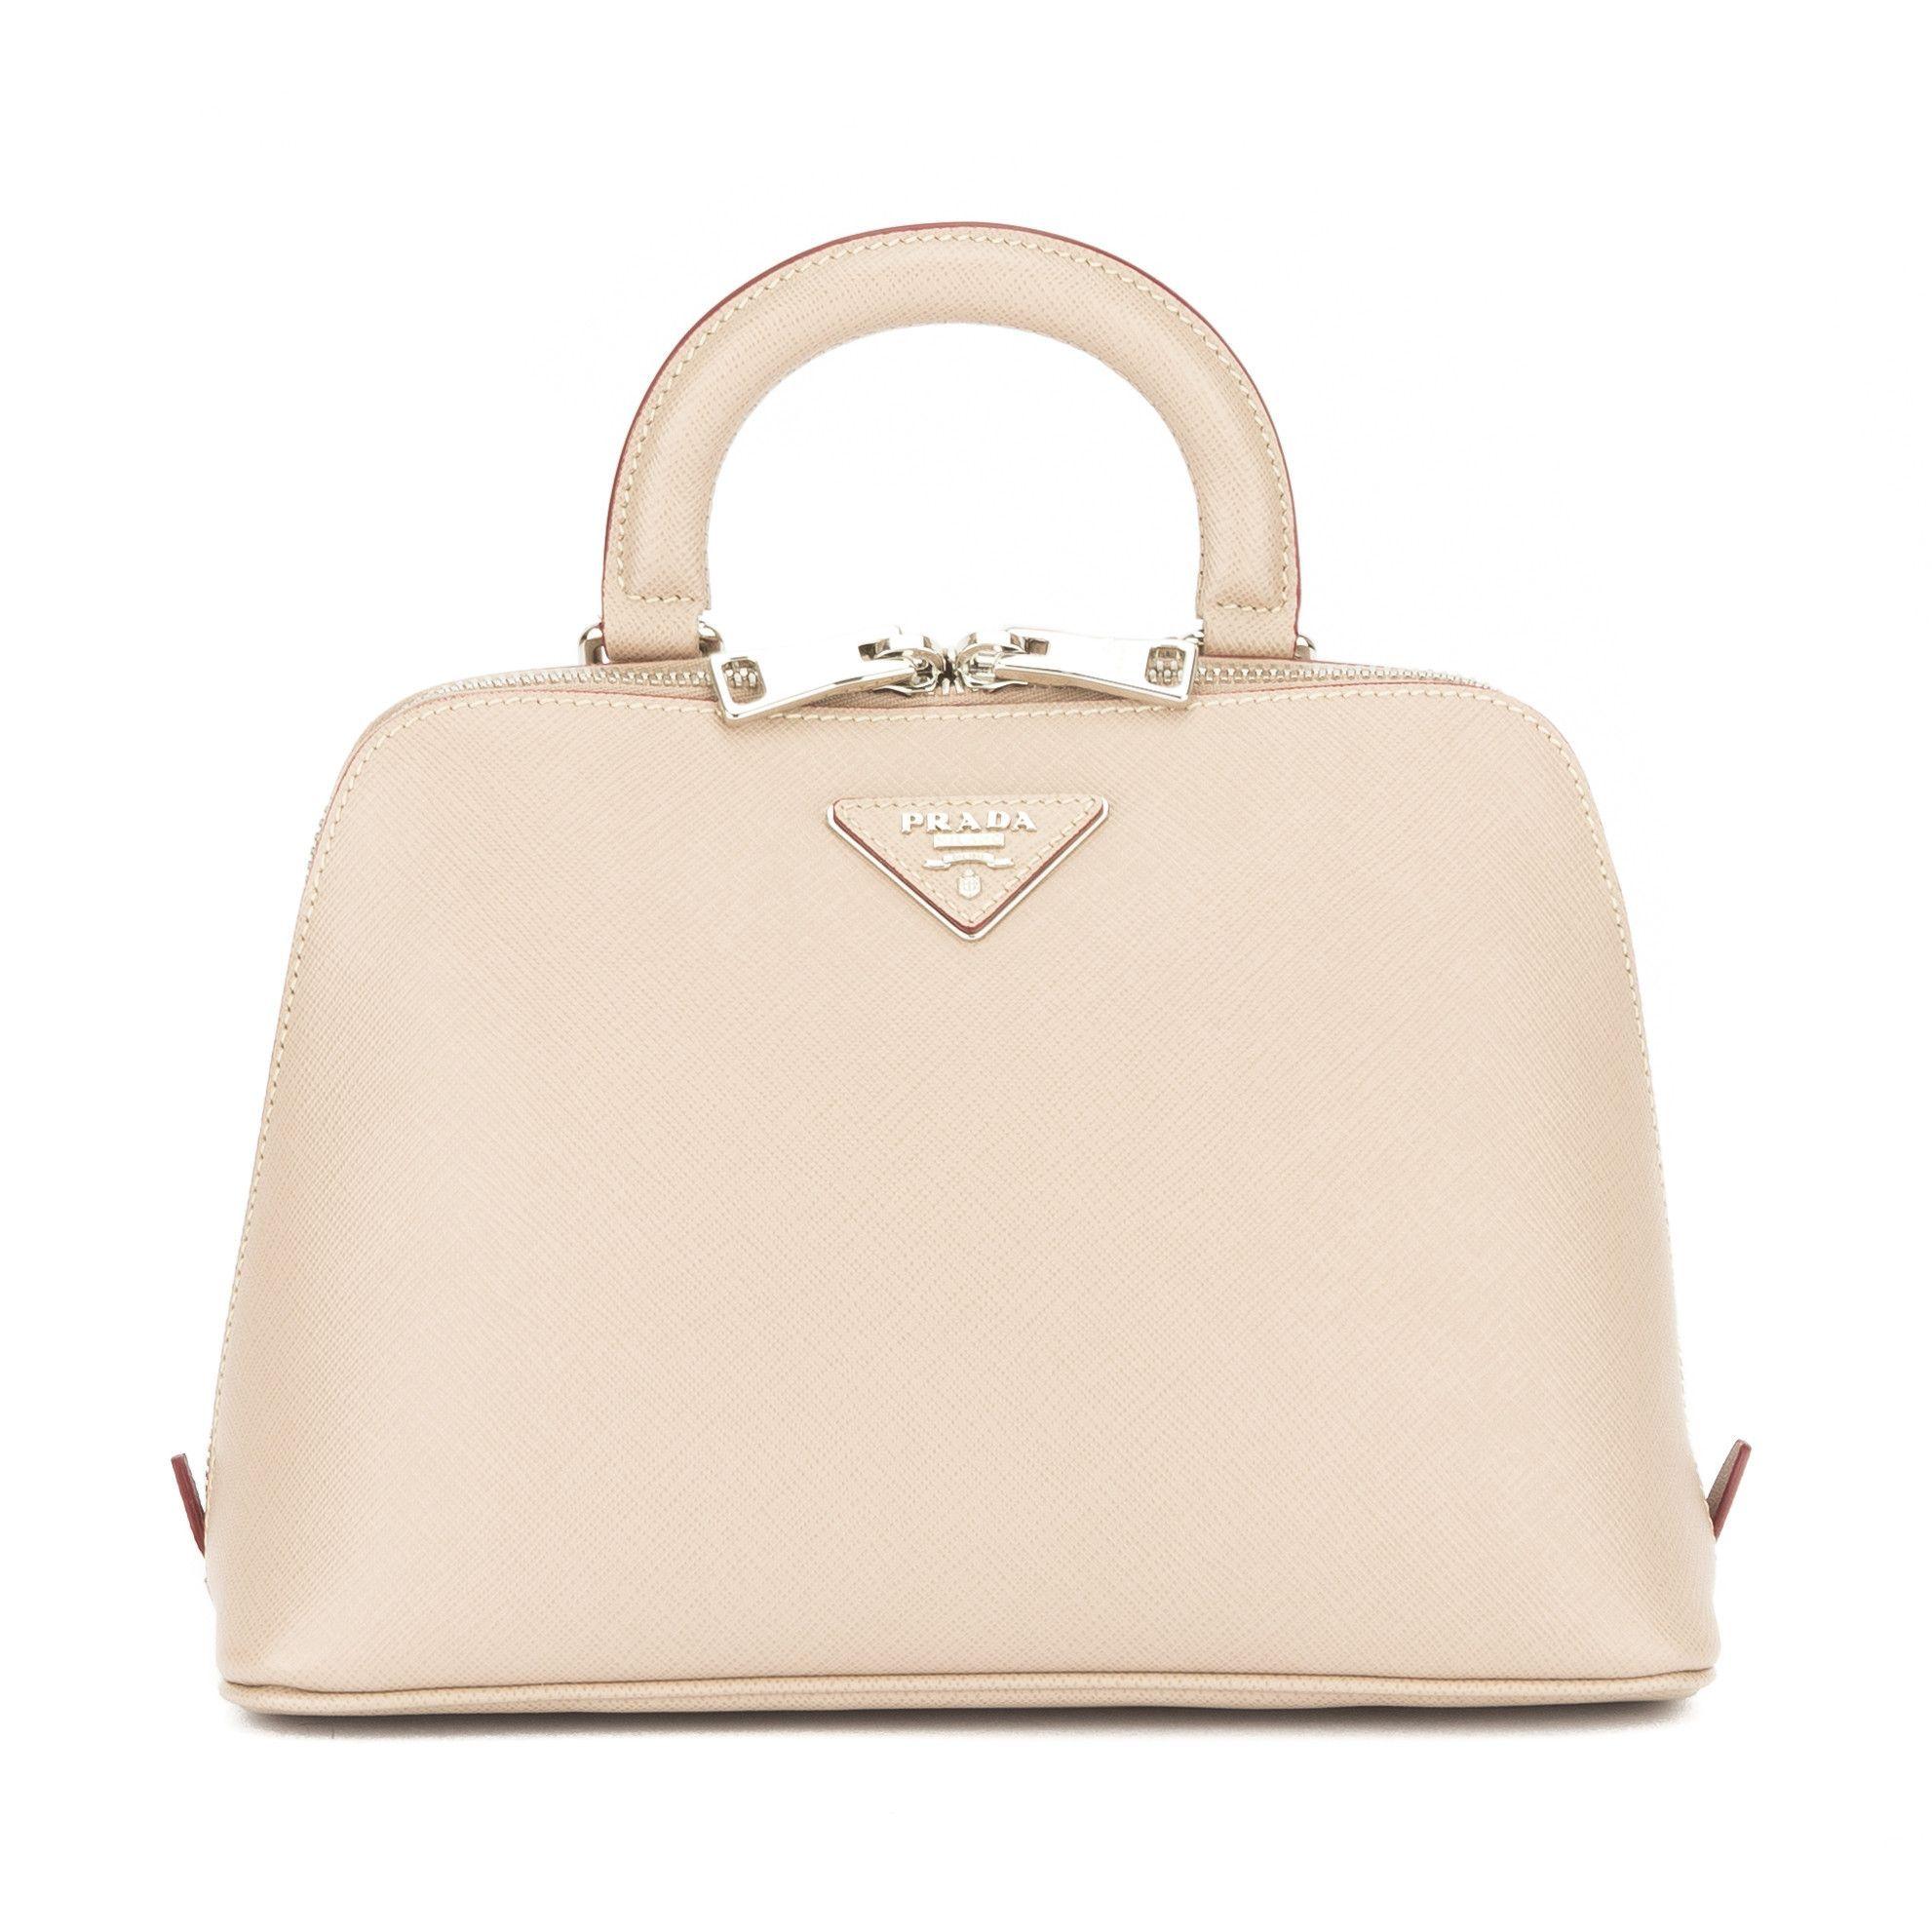 fa35bba2c176 Prada Saffiano Leather Promenade Backpack (New with Tags)